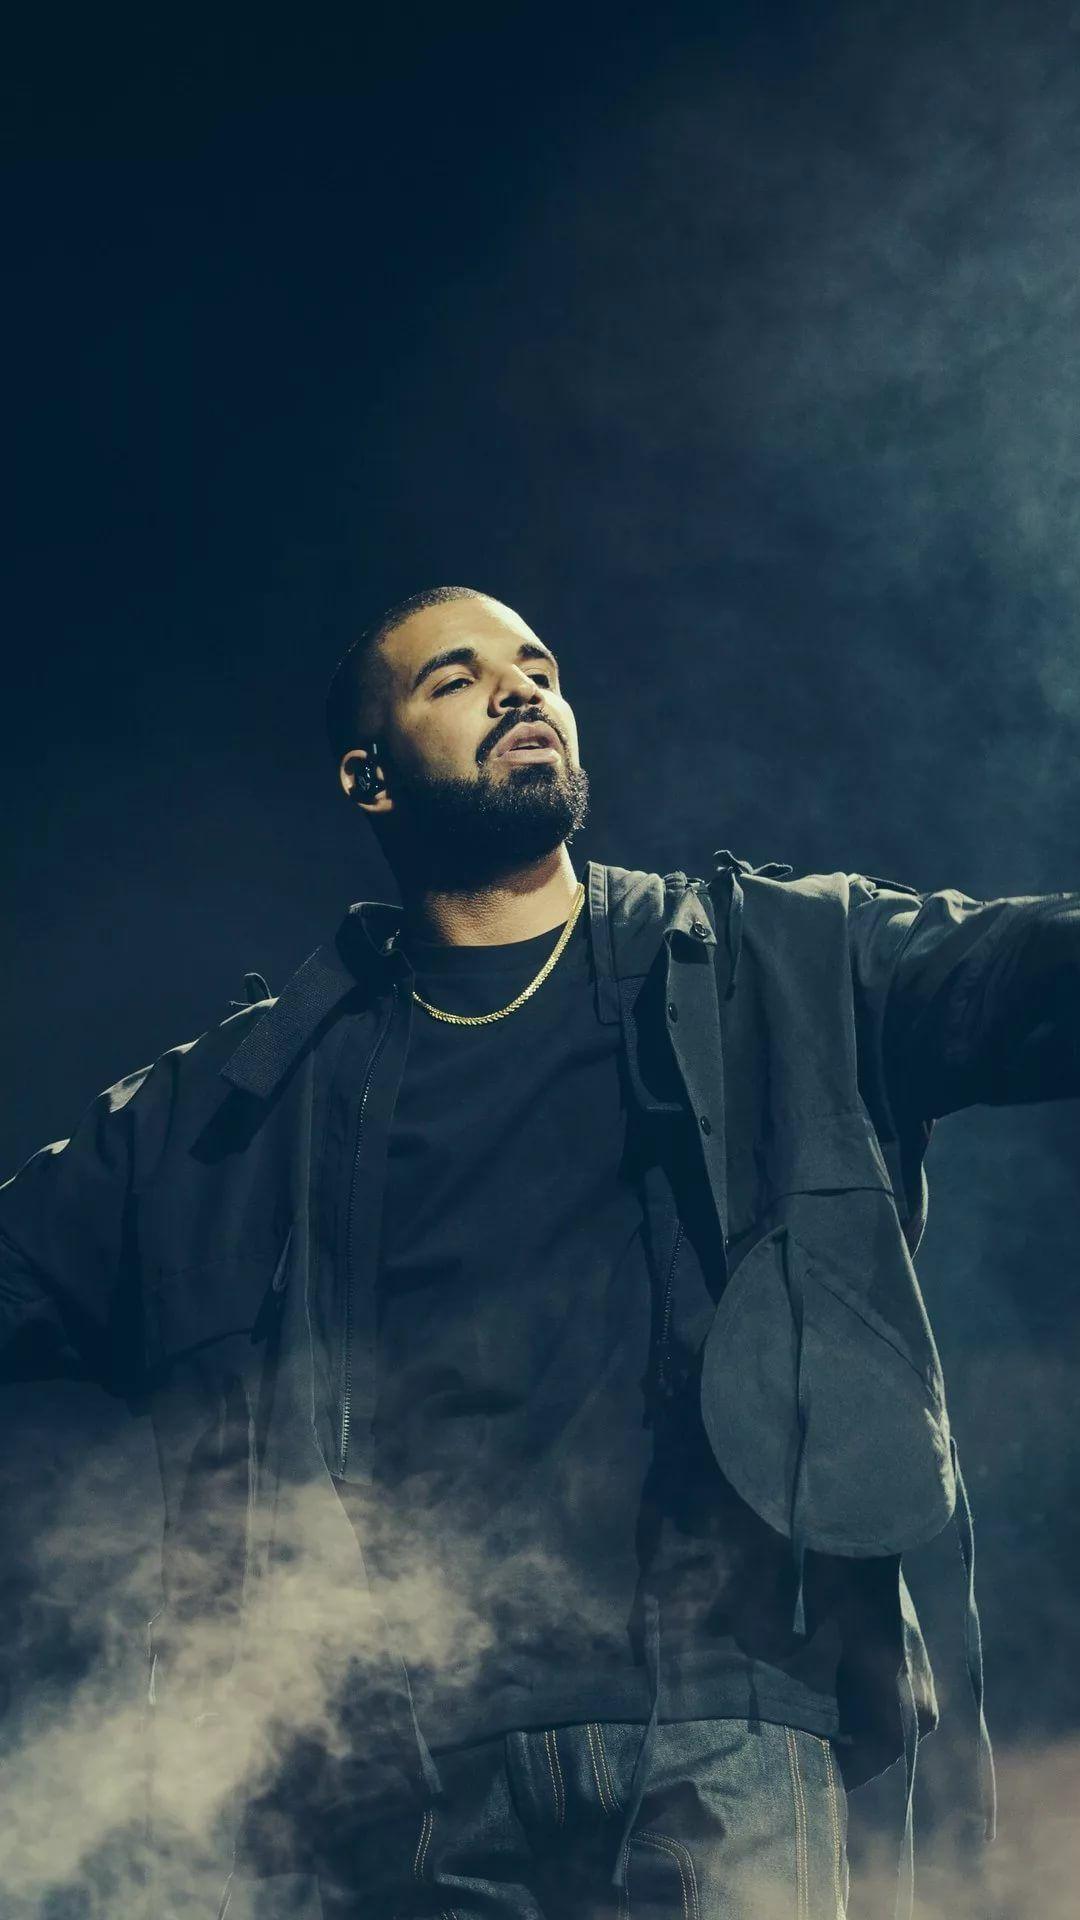 Drake iPhone hd wallpaper